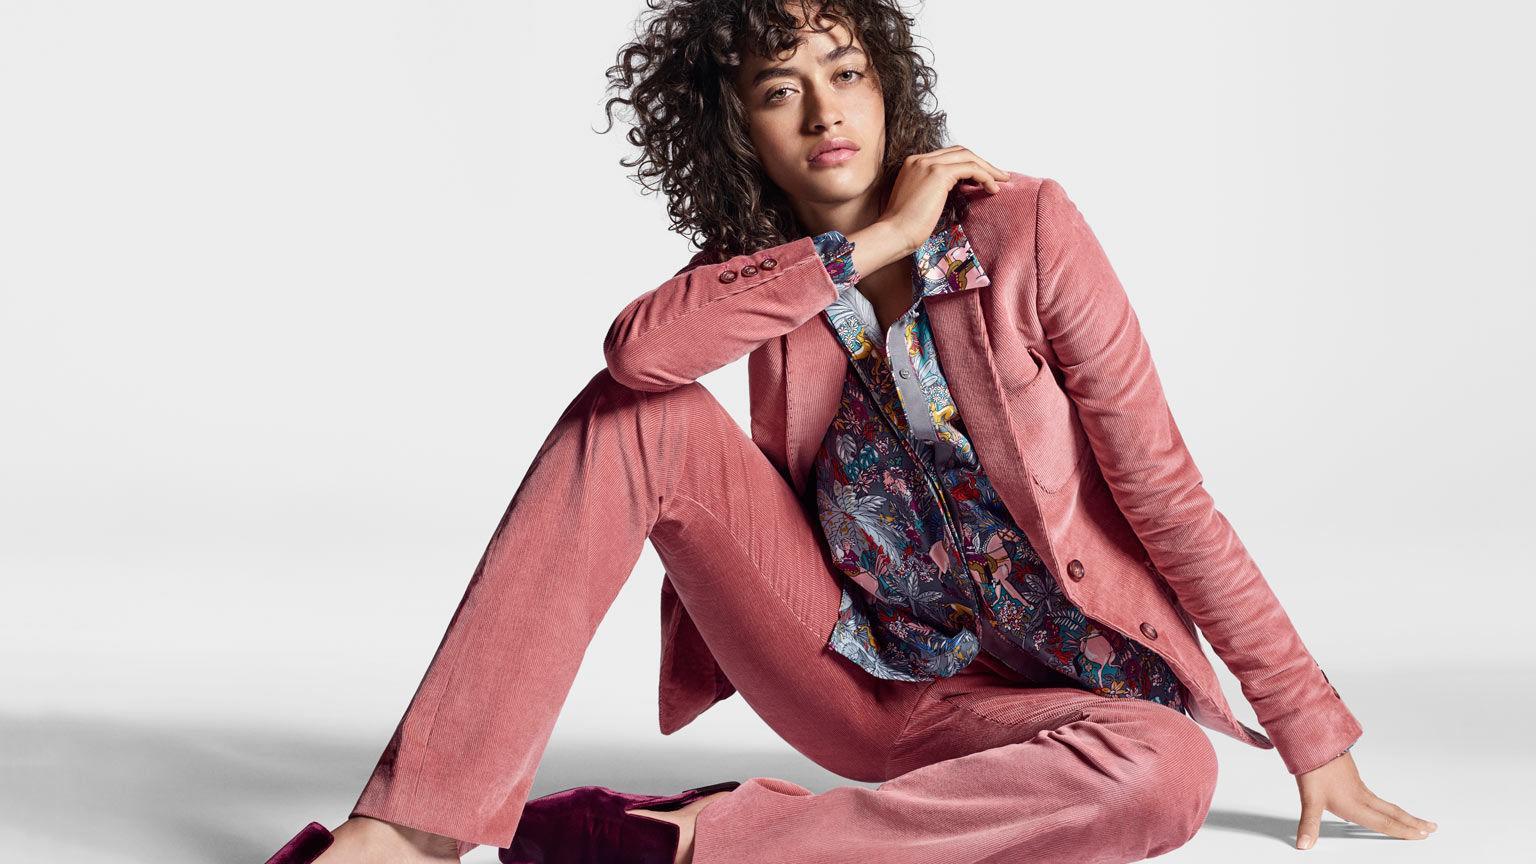 Midwests Latest Victorias Secret Model Will Rock Curls In Paris Debs Retail Details Stltoday Com